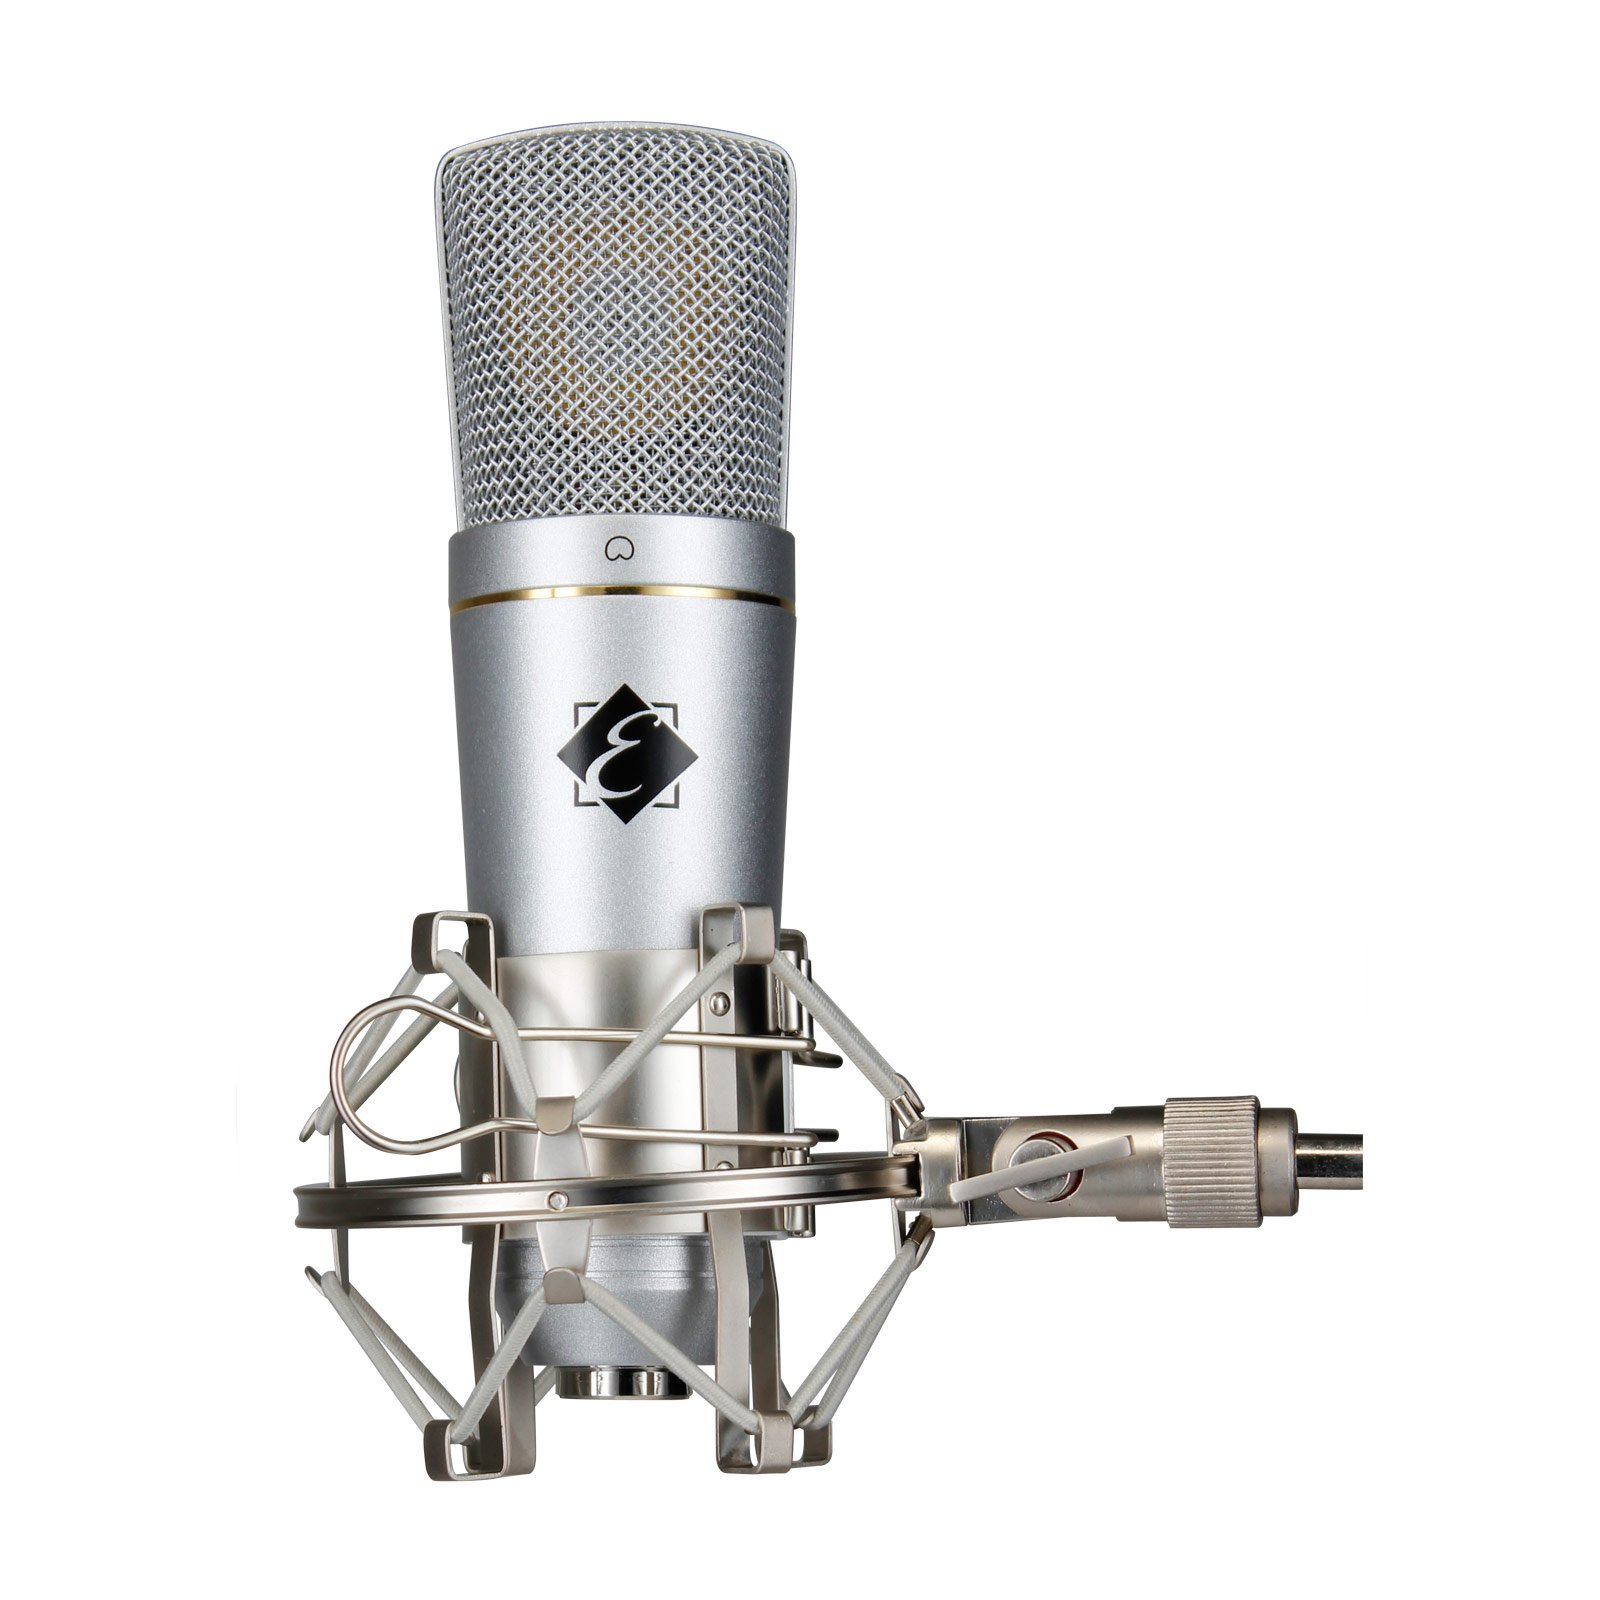 Eagletone UM30 Microphone USB Gris product image